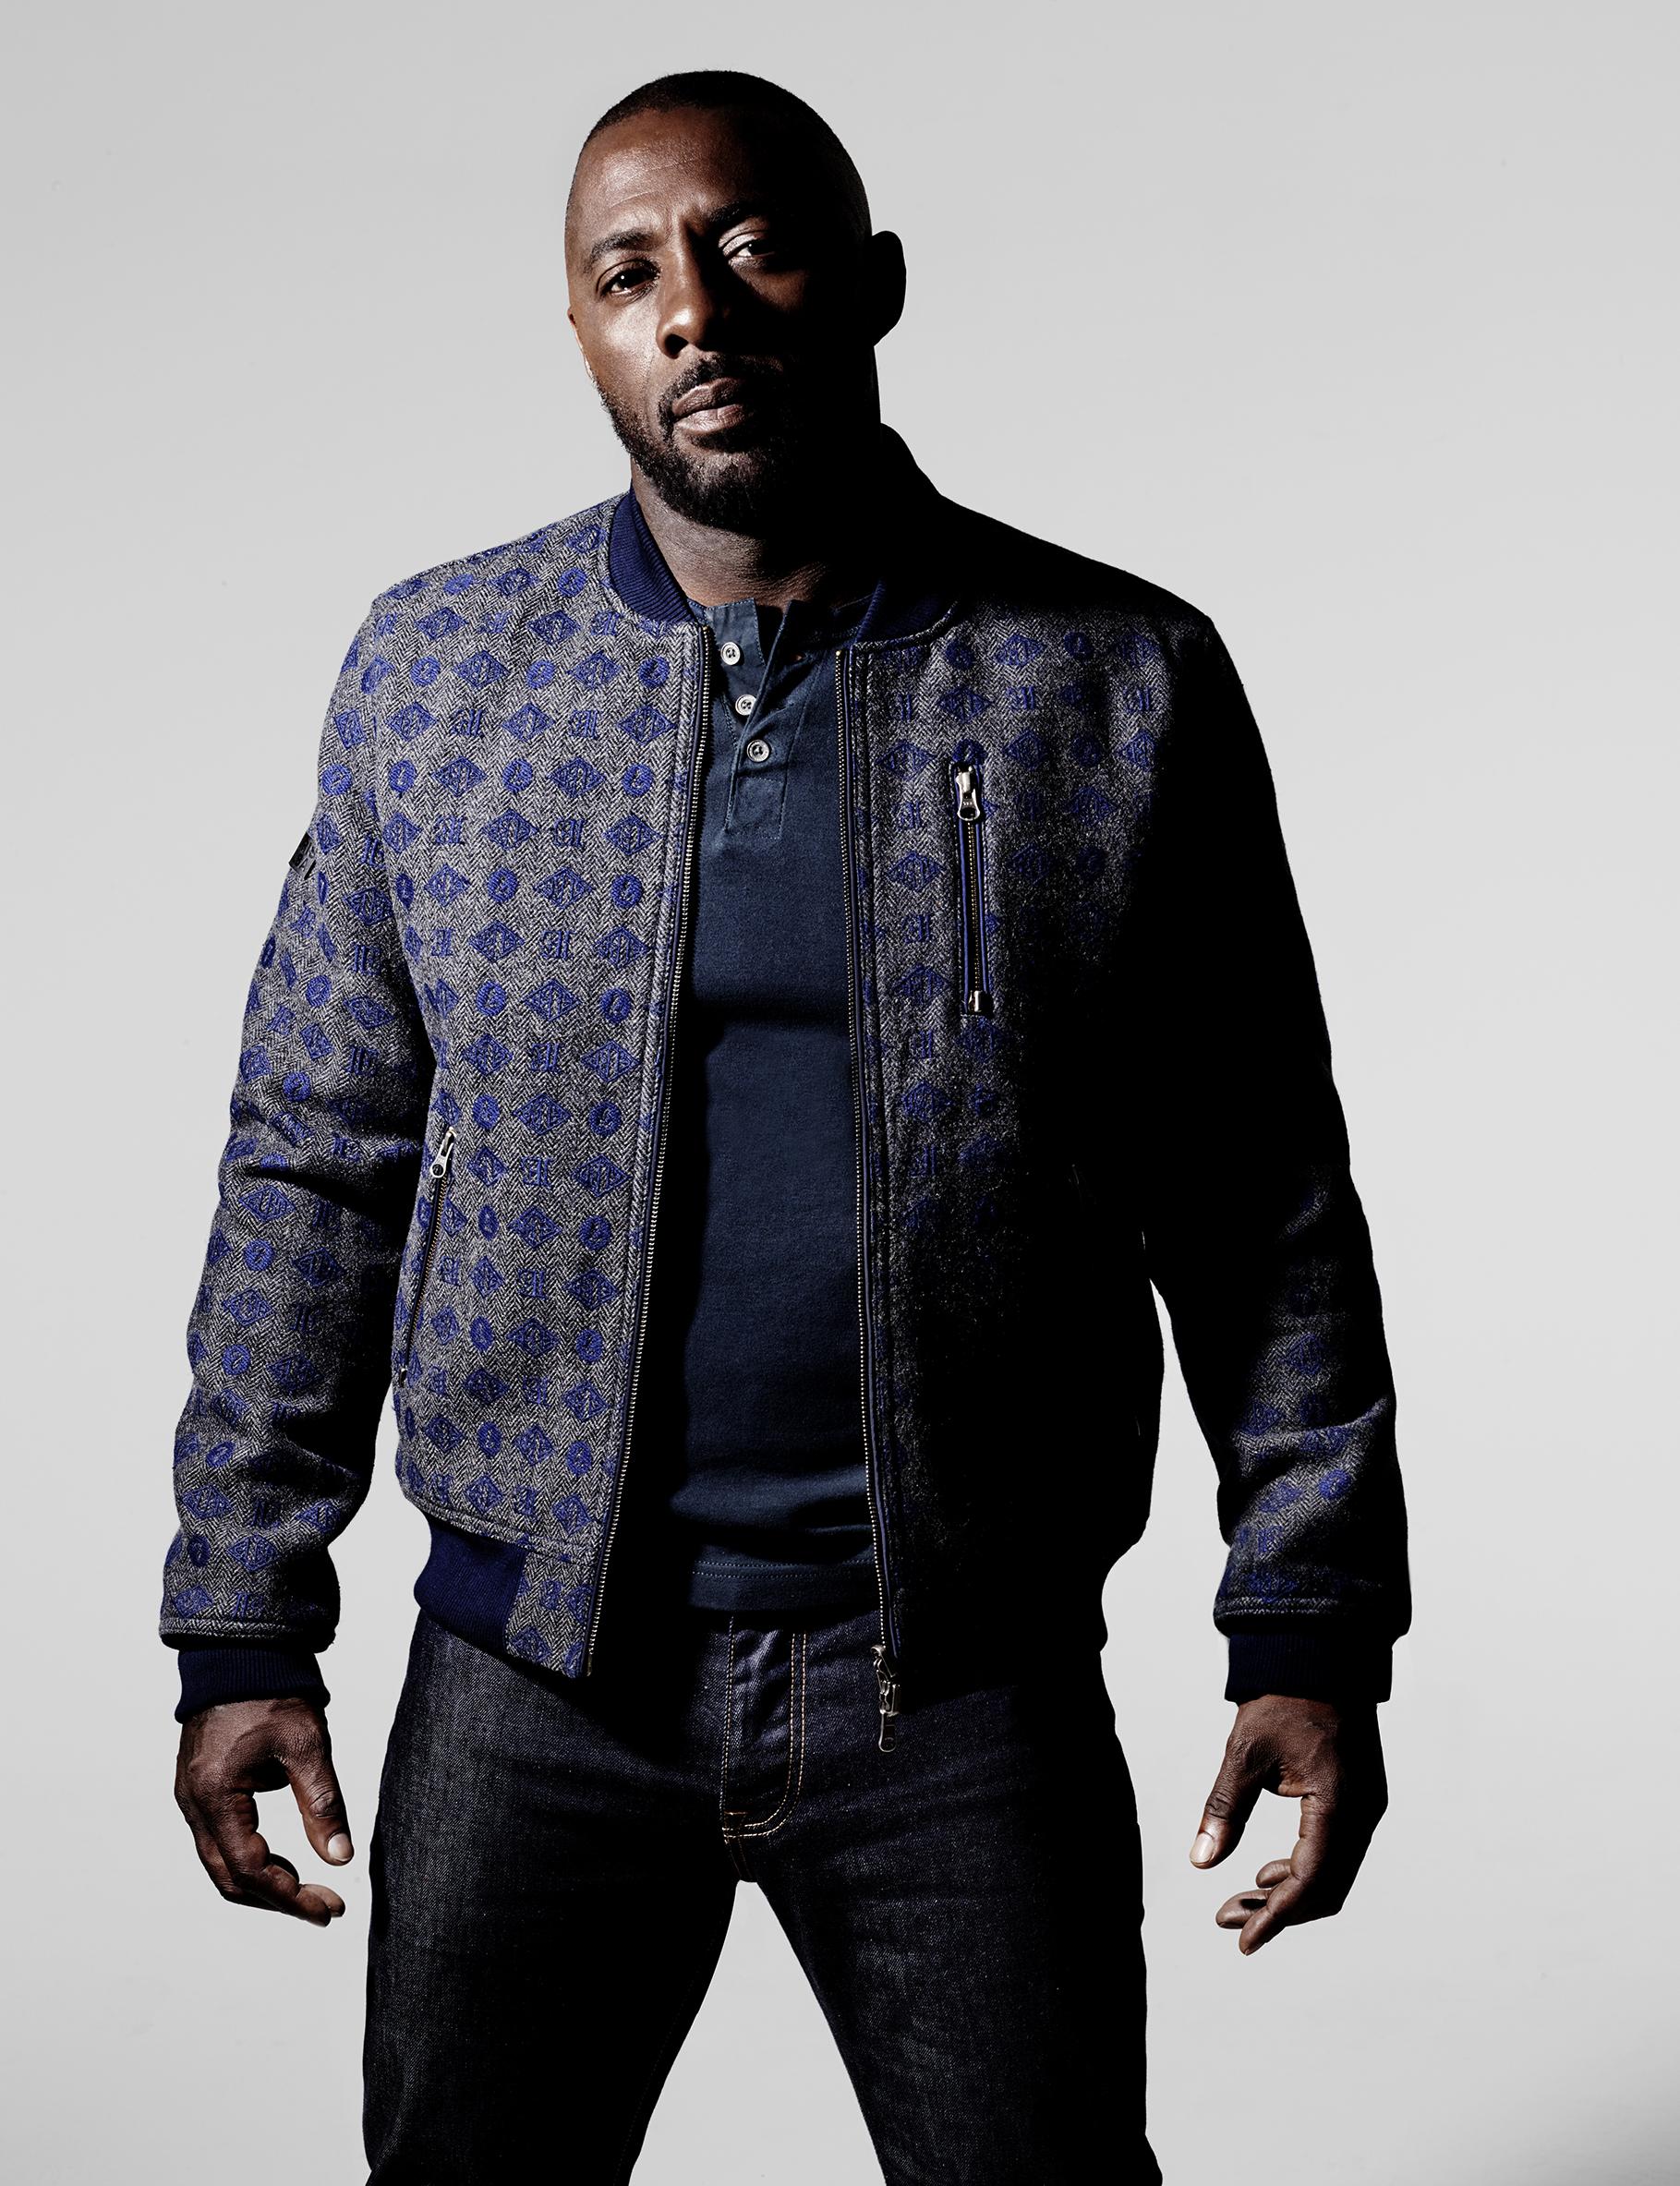 Pitti Uomo Firenze Idris Elba Superstar Di Superdry